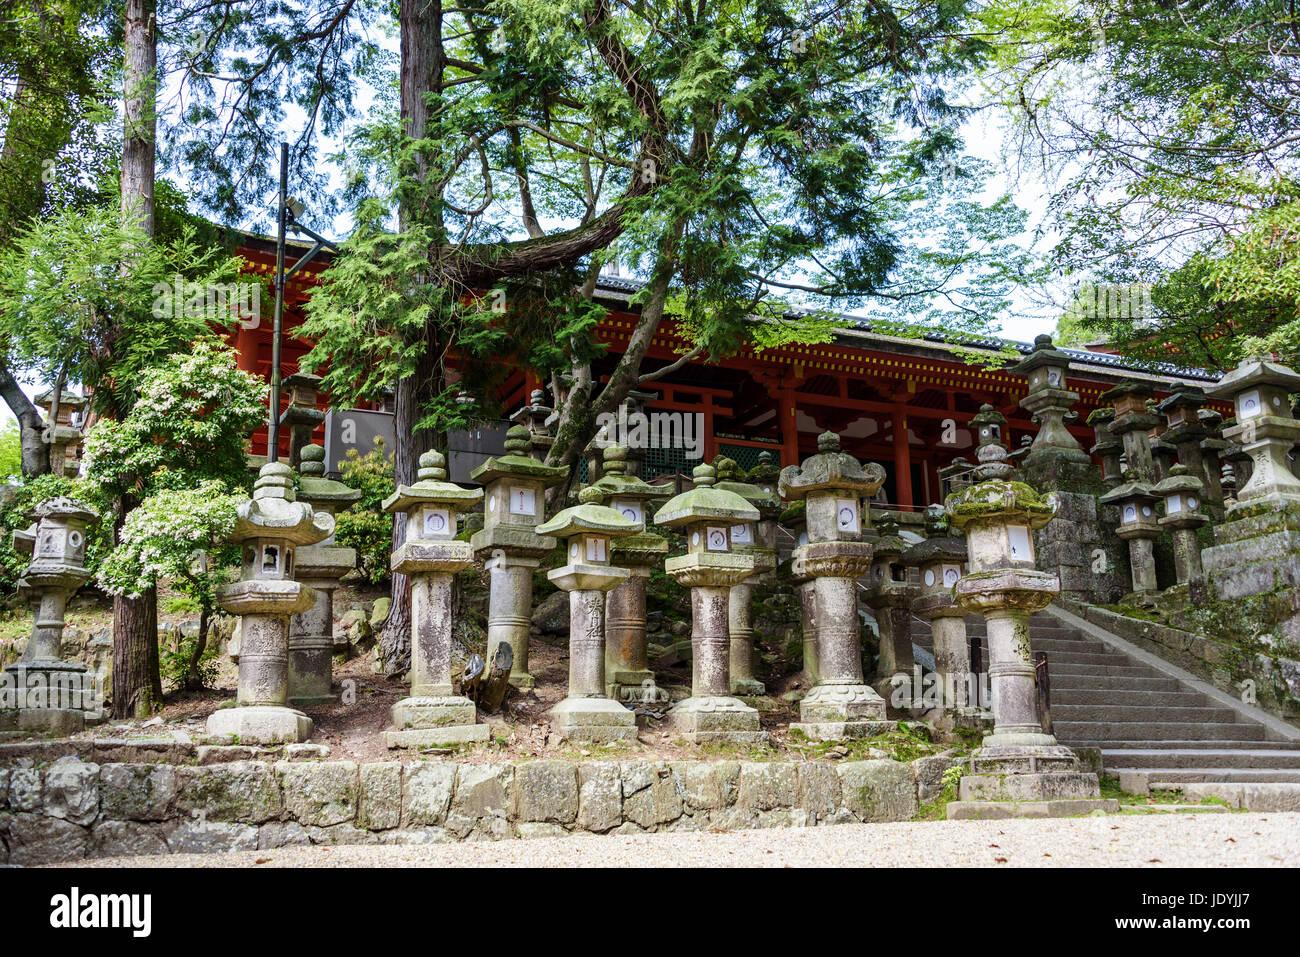 kasuga-taisha stone lanterns - Stock Image